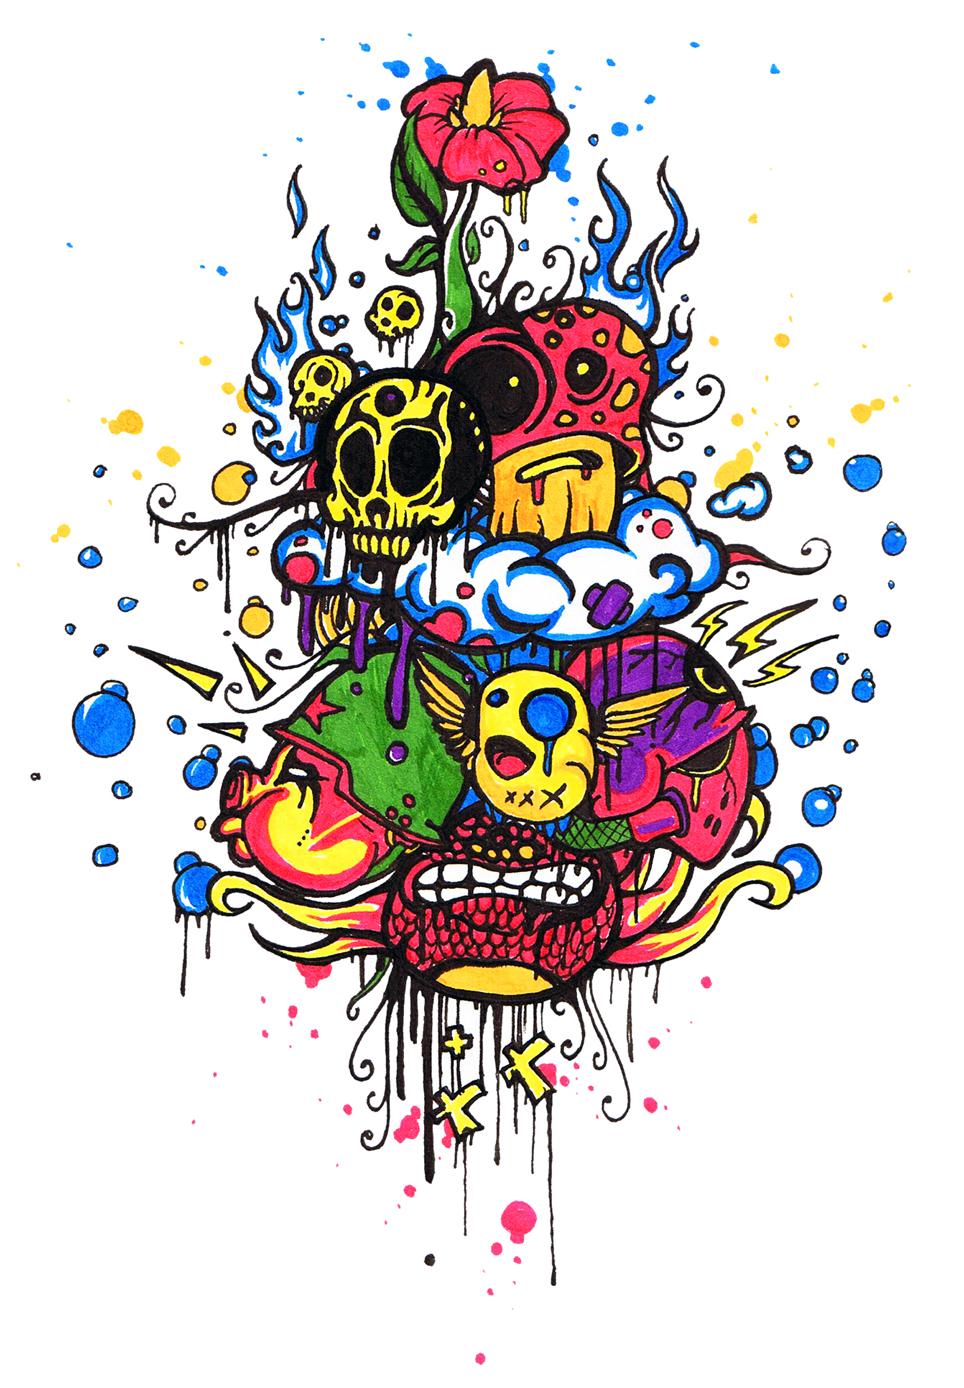 Freaky Creatures doodle